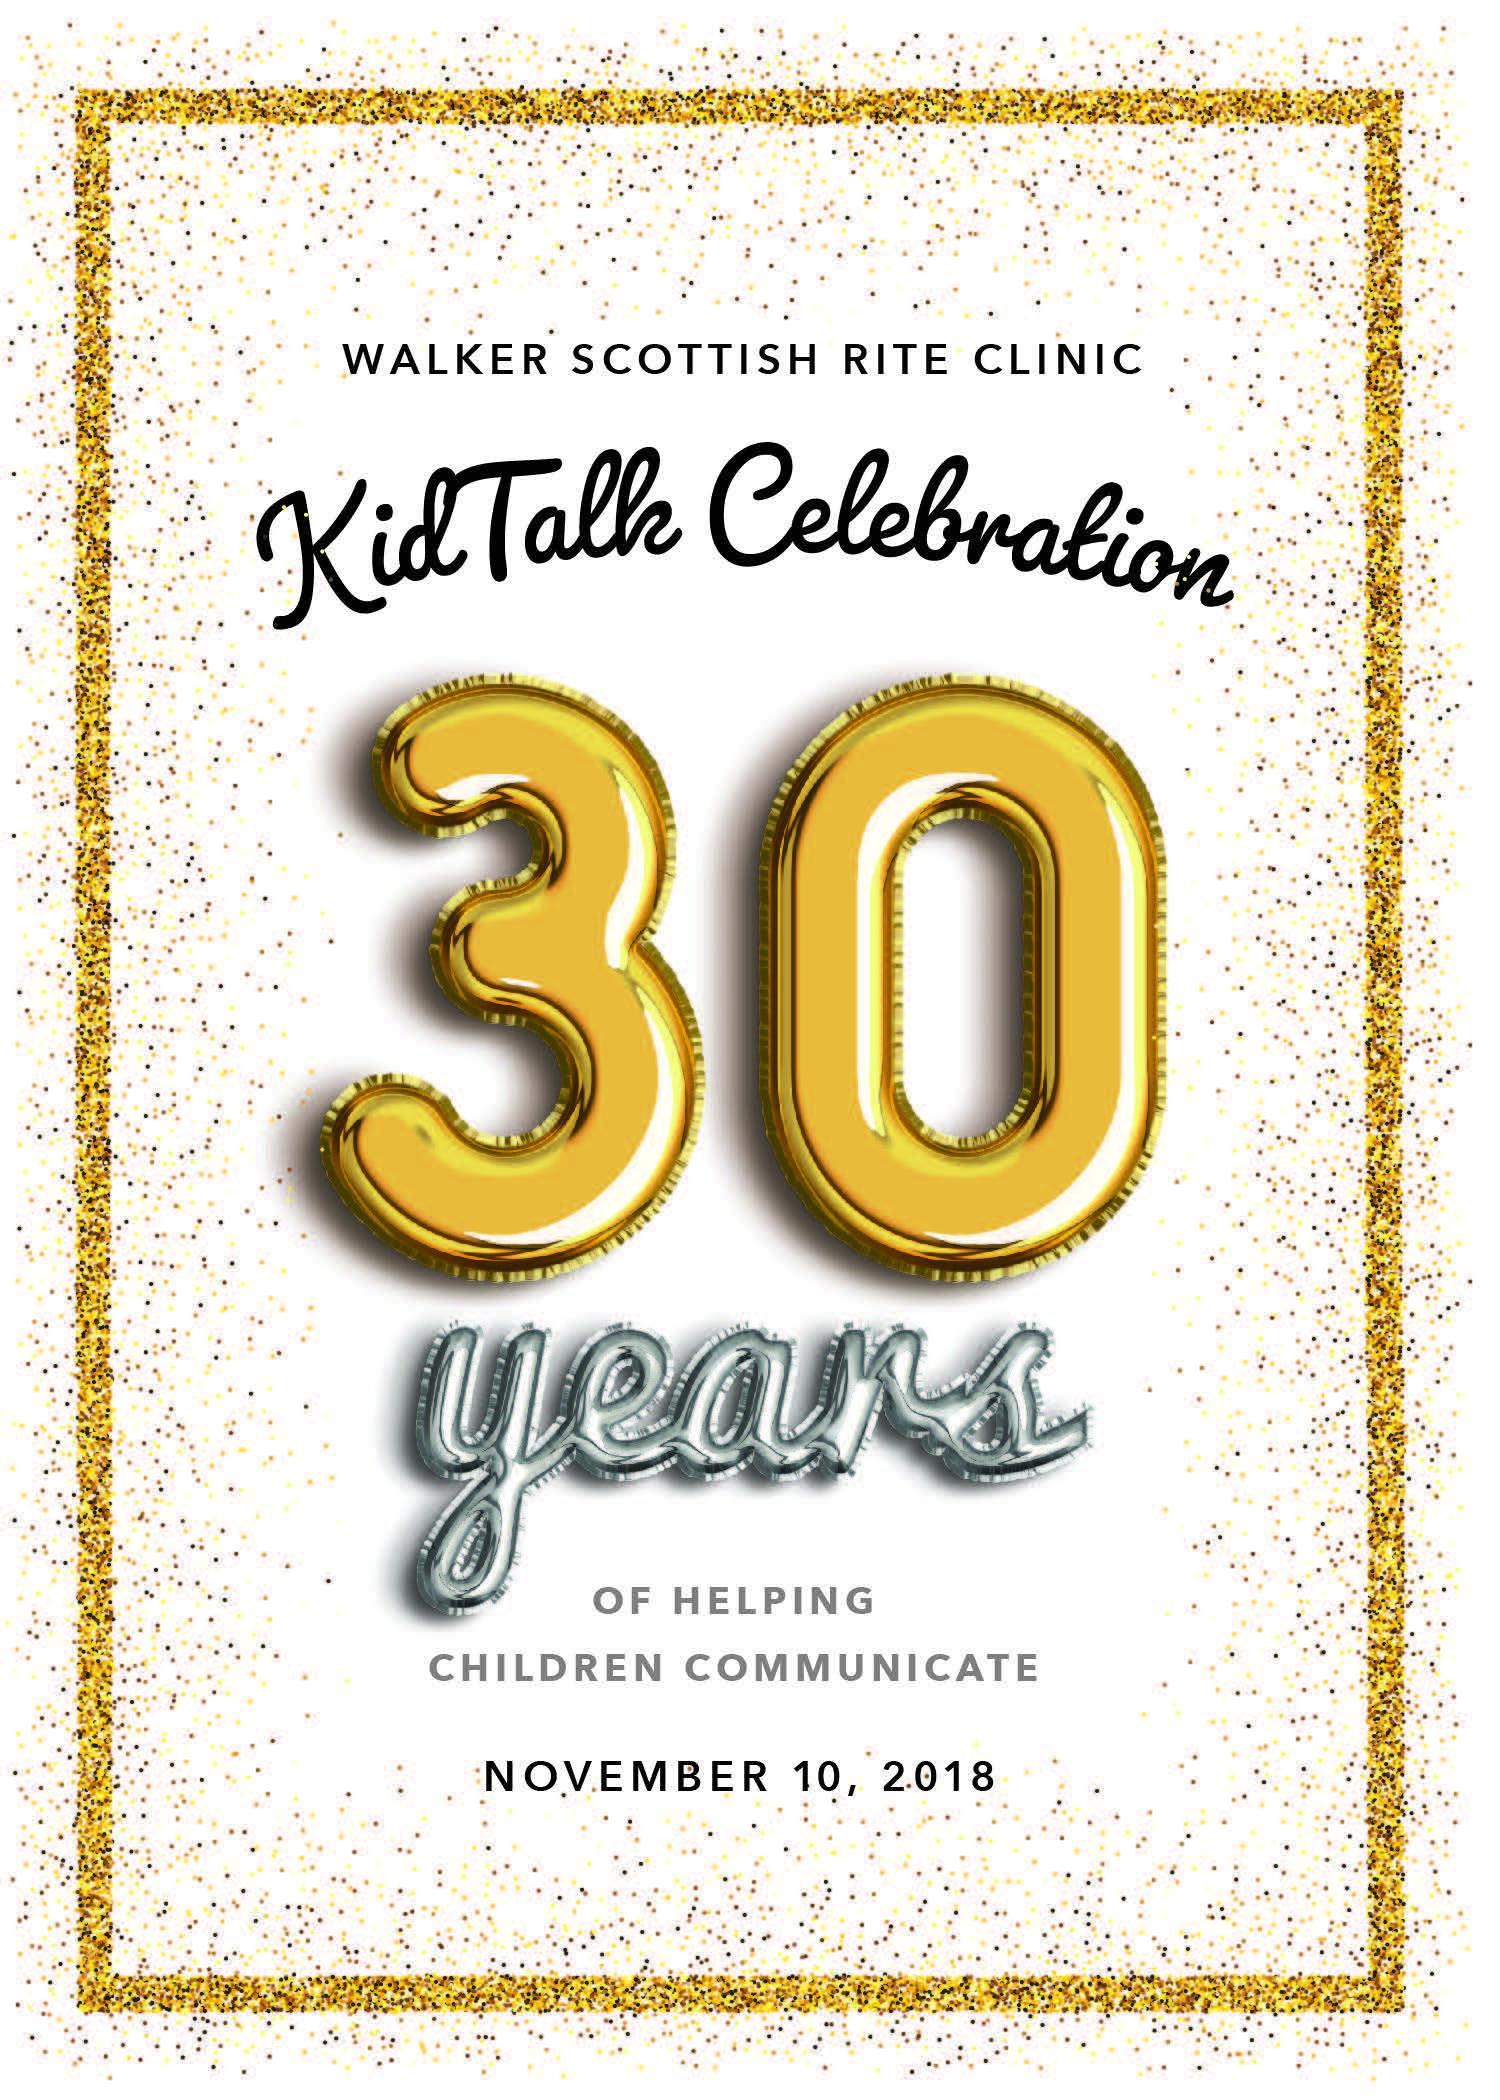 KidTalk Celebration - 30 Years